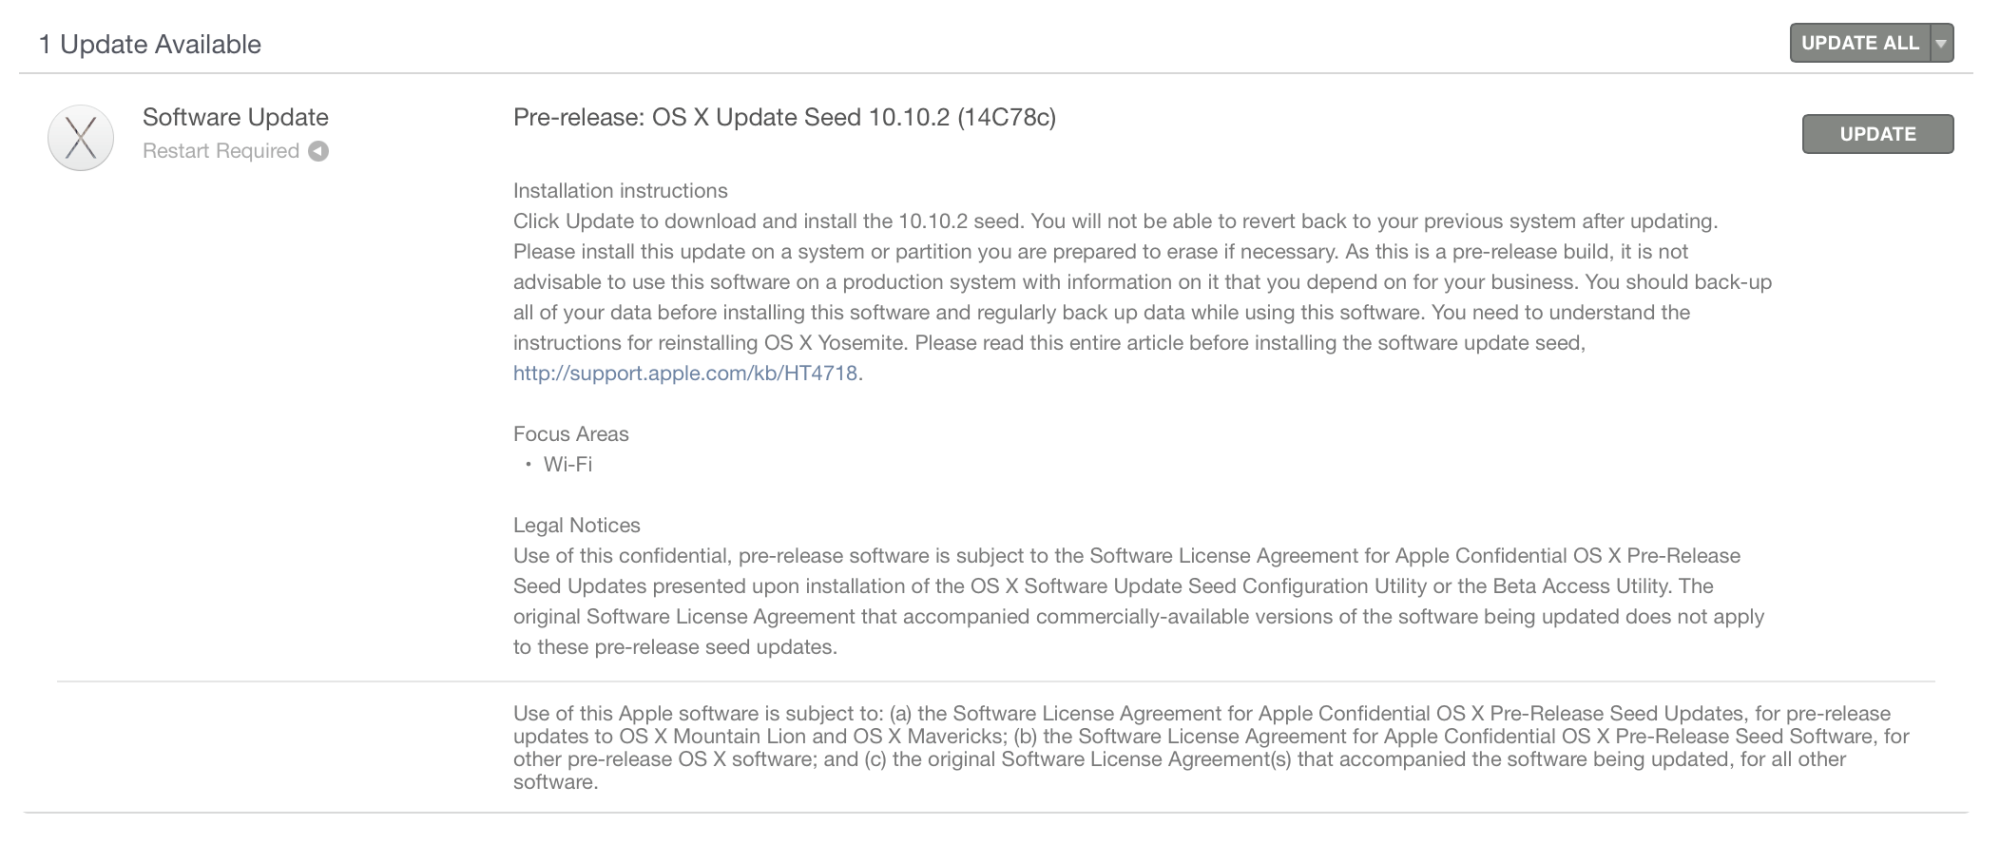 「OS X Yosemite 10.10.2」のベータ版2を開発者向けに提供開始!未だに報告されているWi-Fiの不具合を中心に改善